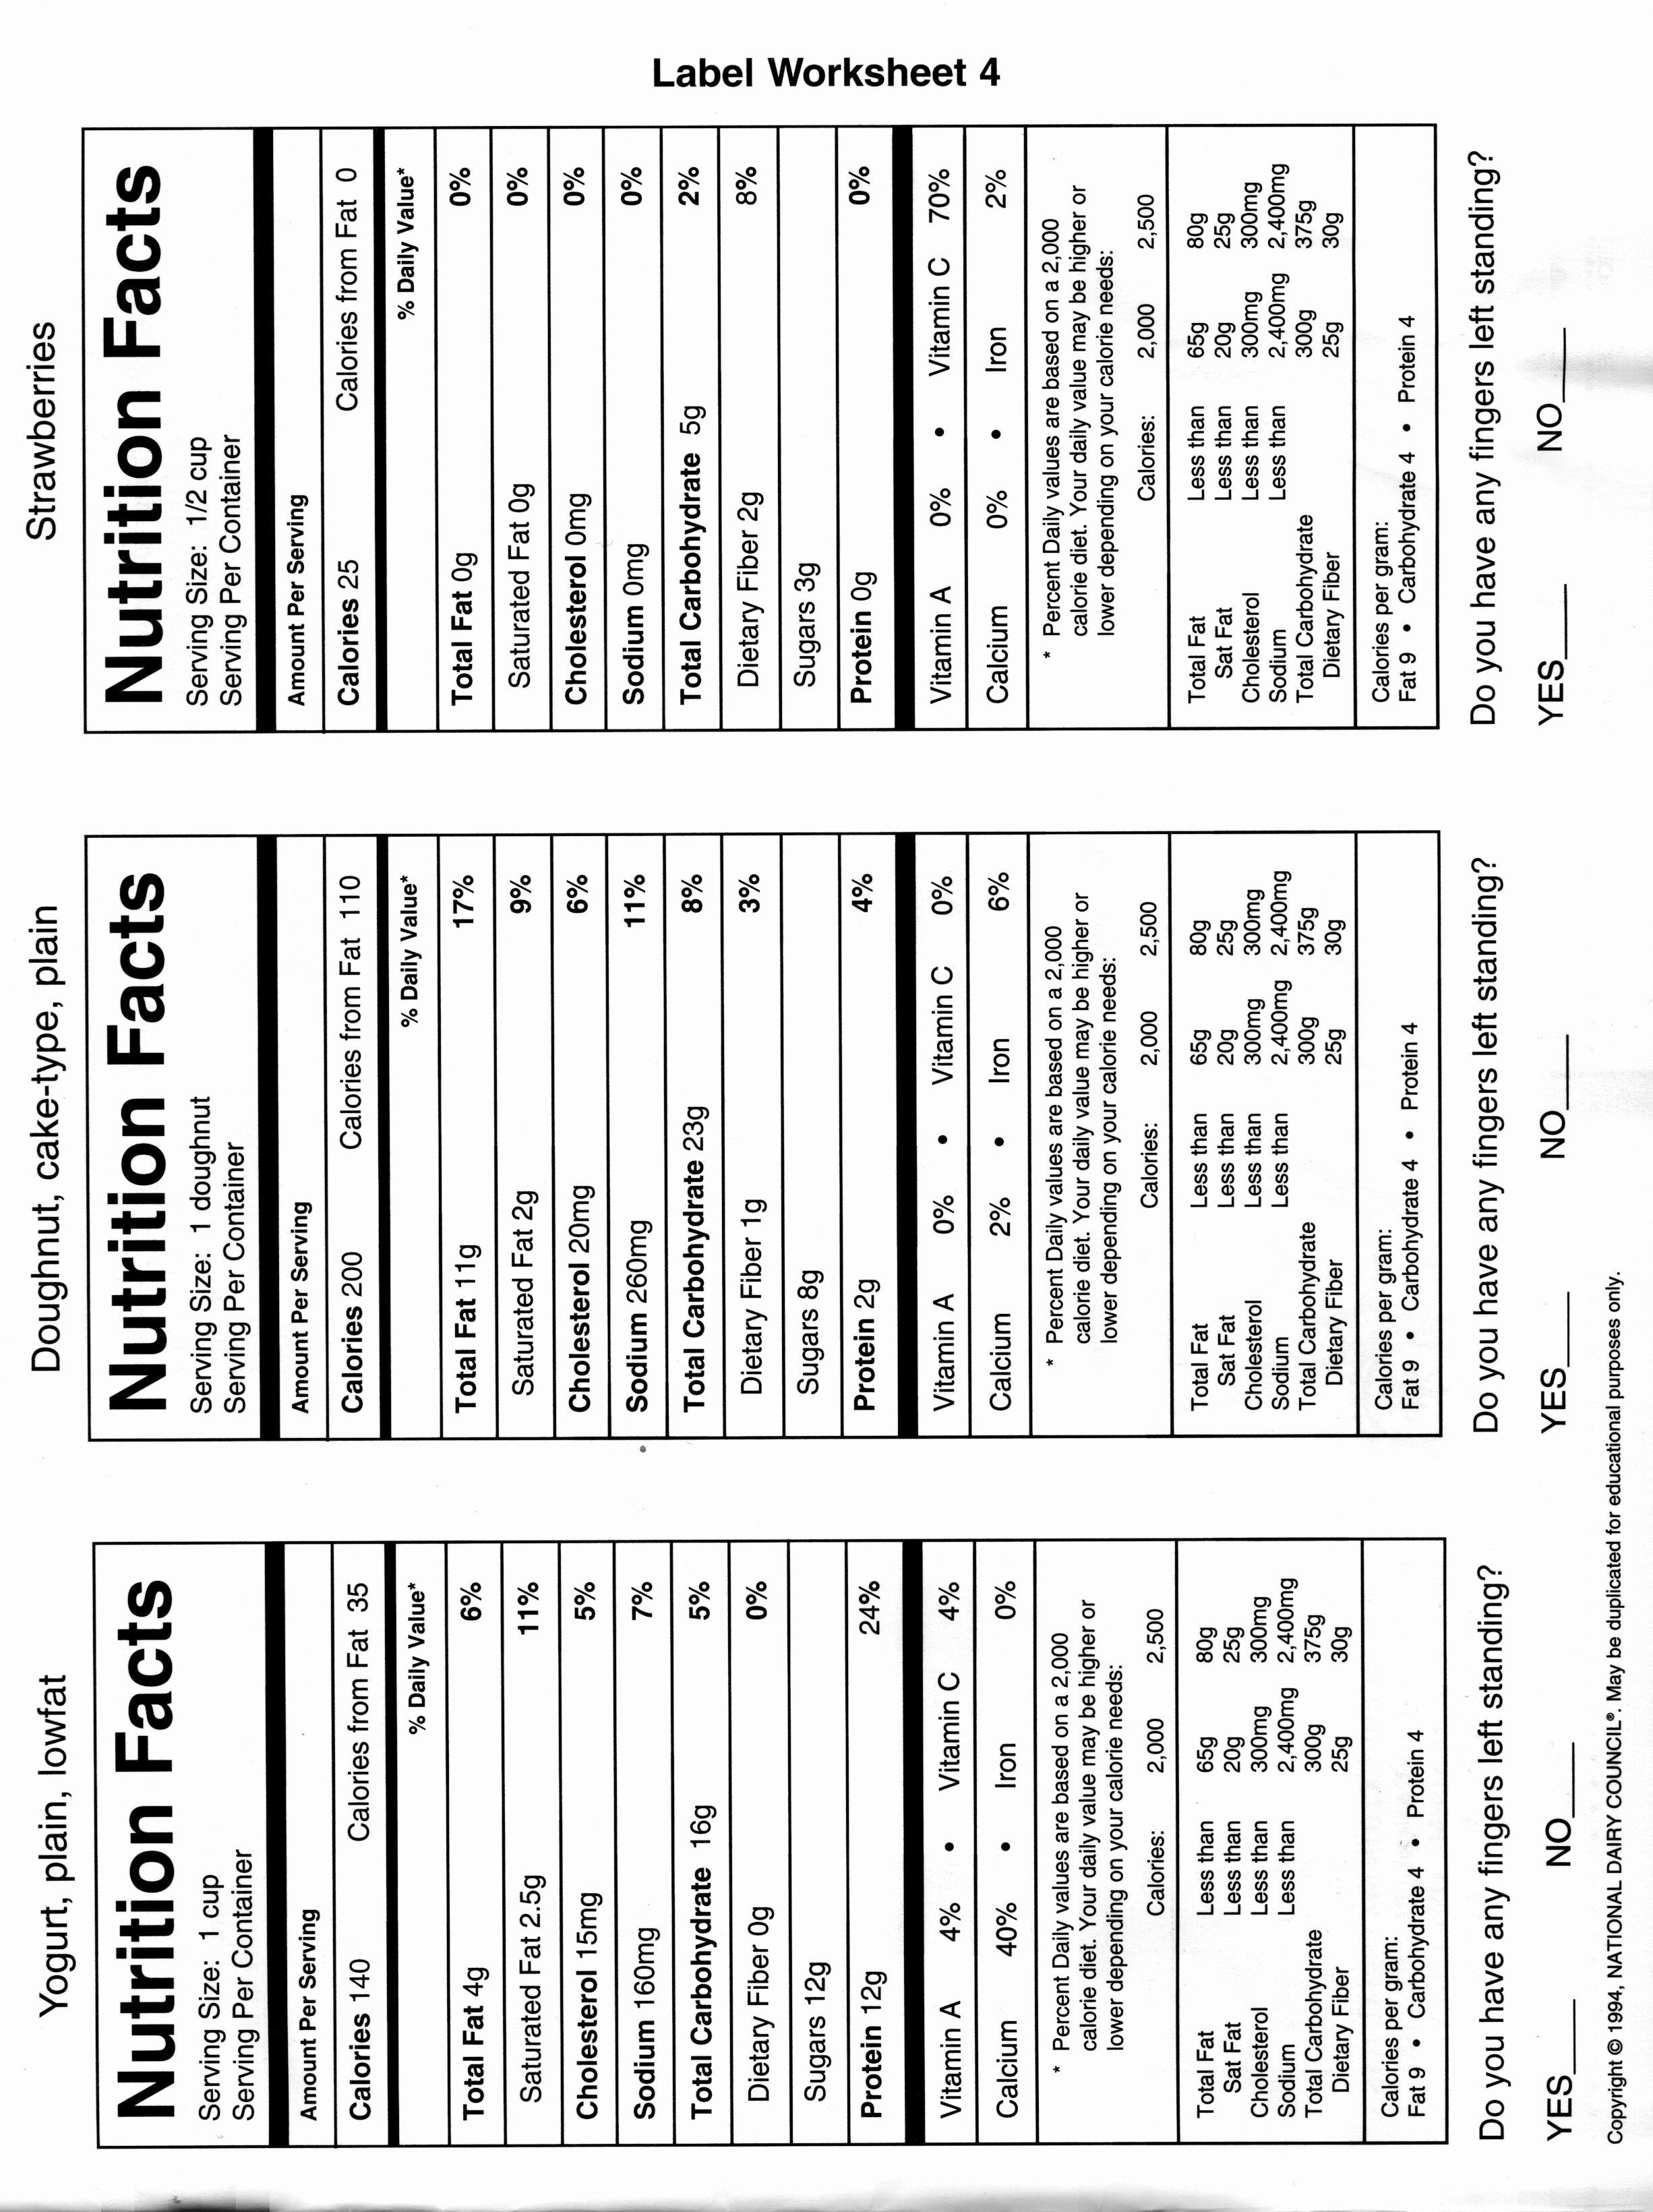 50 Blank Nutrition Label Worksheet In